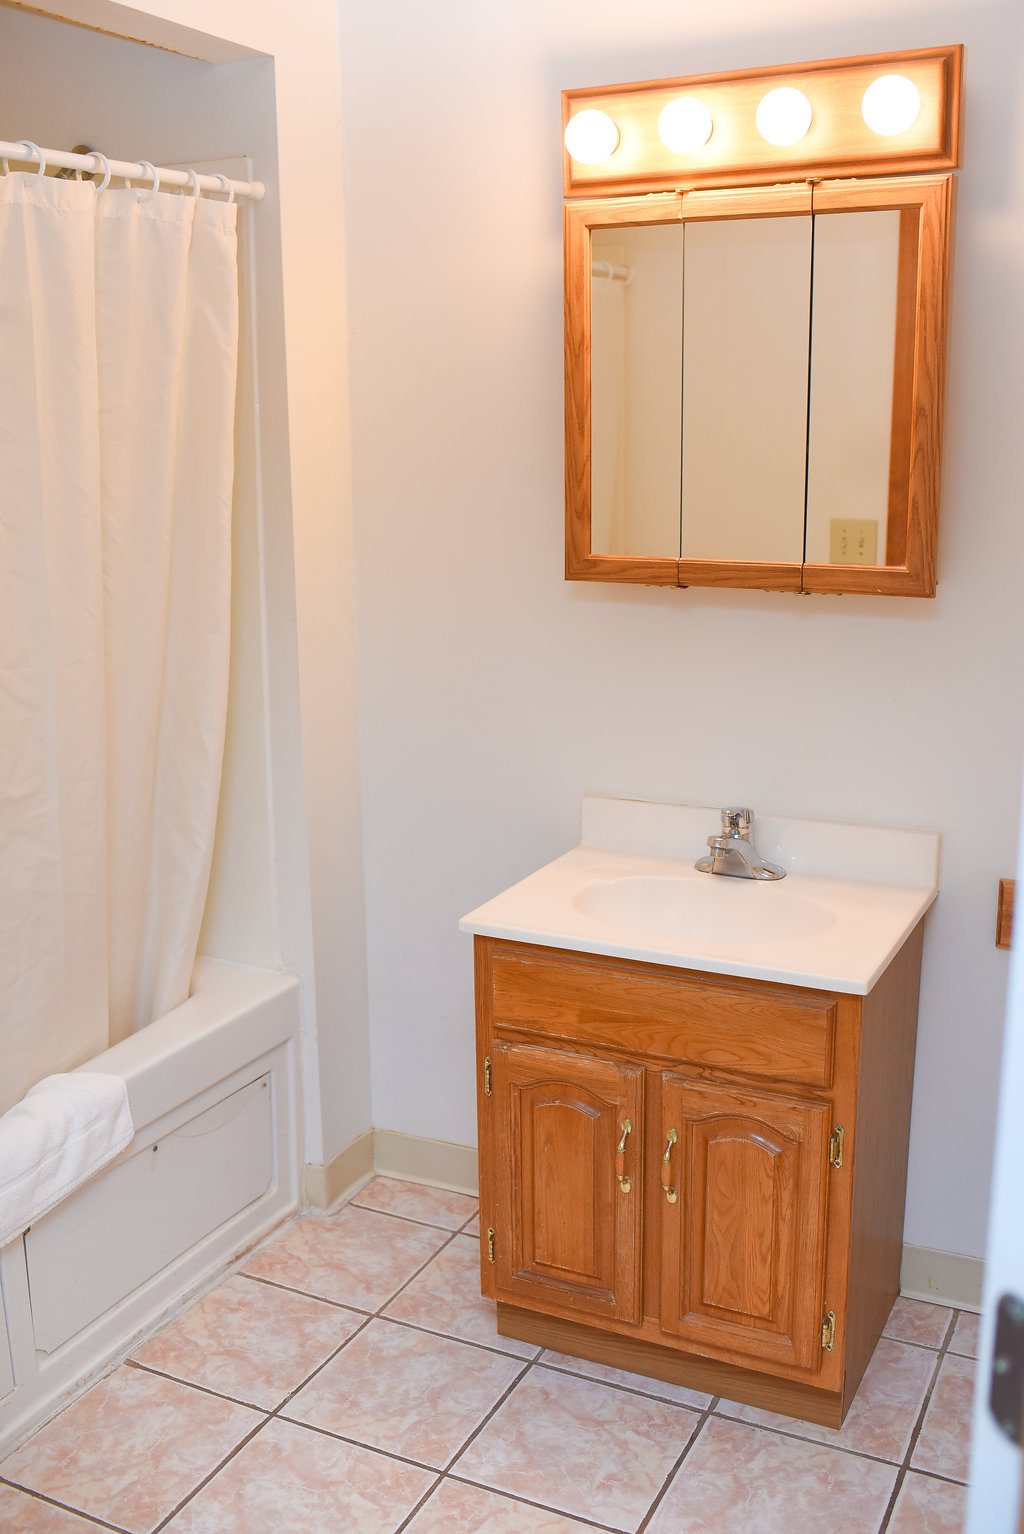 Main Lodge Bathroom